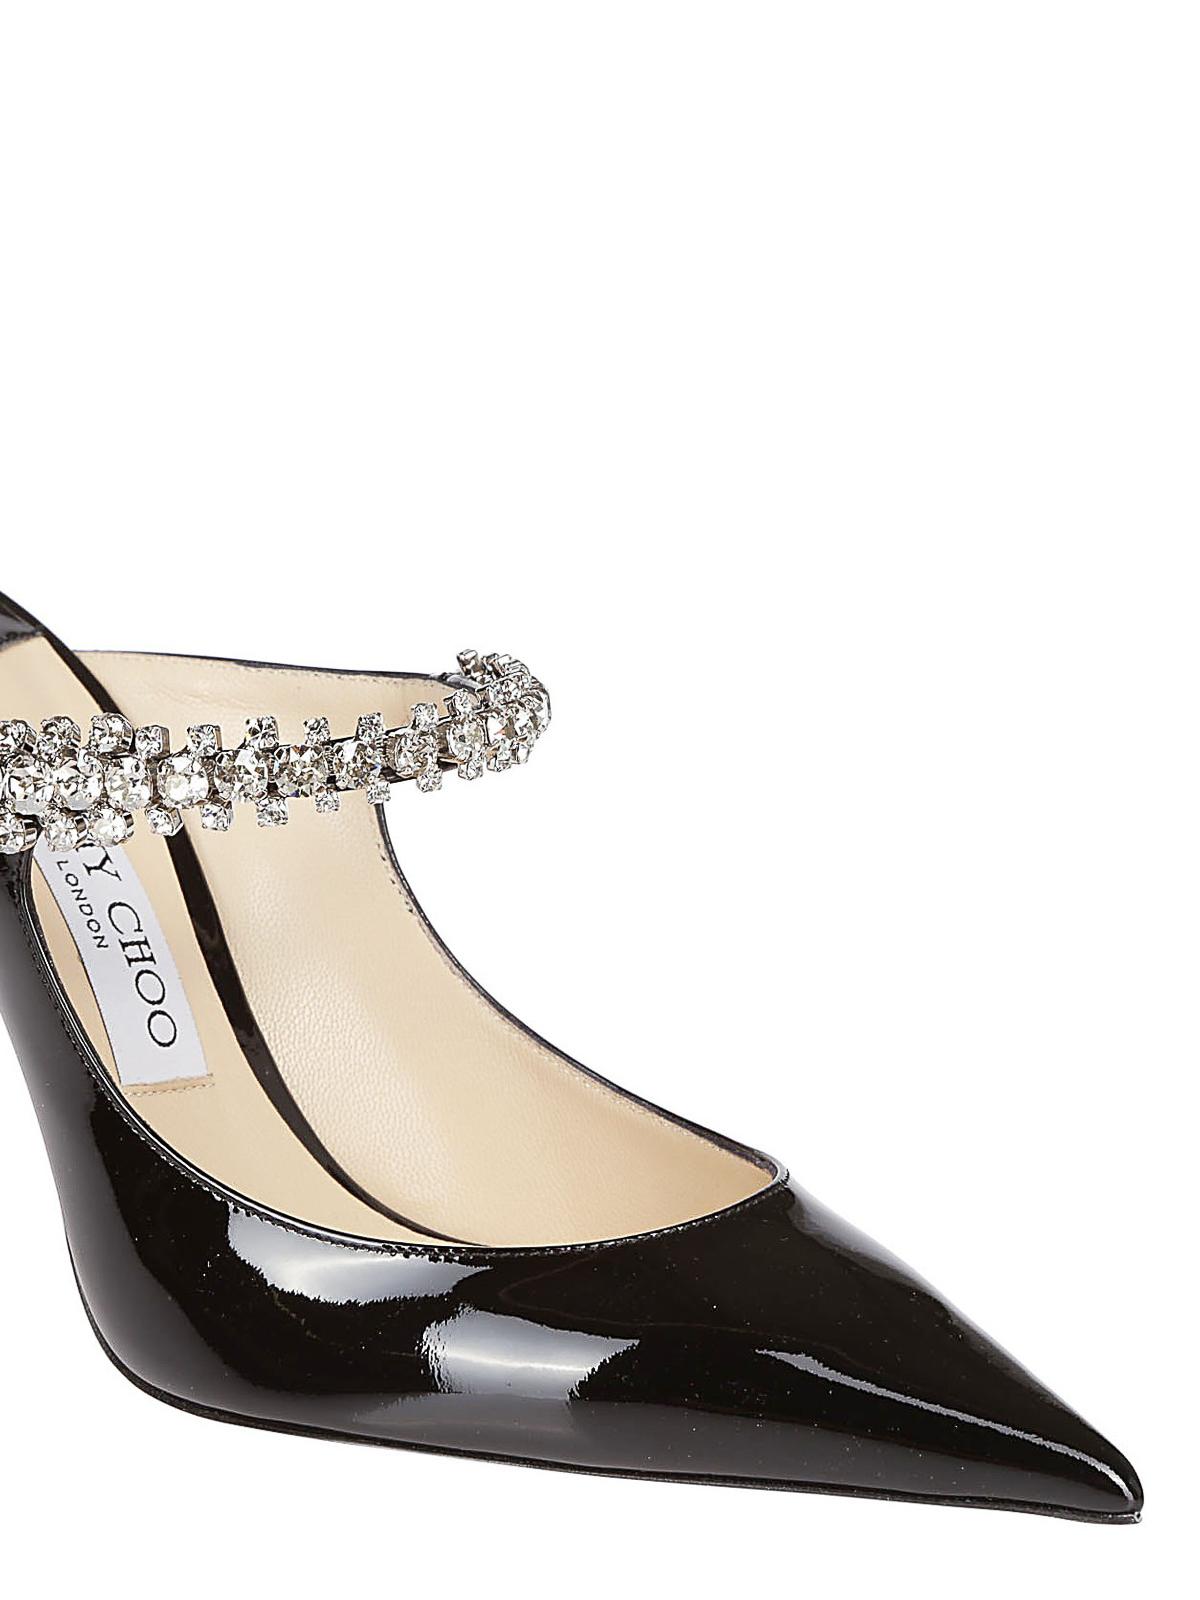 f6193d55266c iKRIX JIMMY CHOO  mules shoes - Bing 100 jewelled patent mules